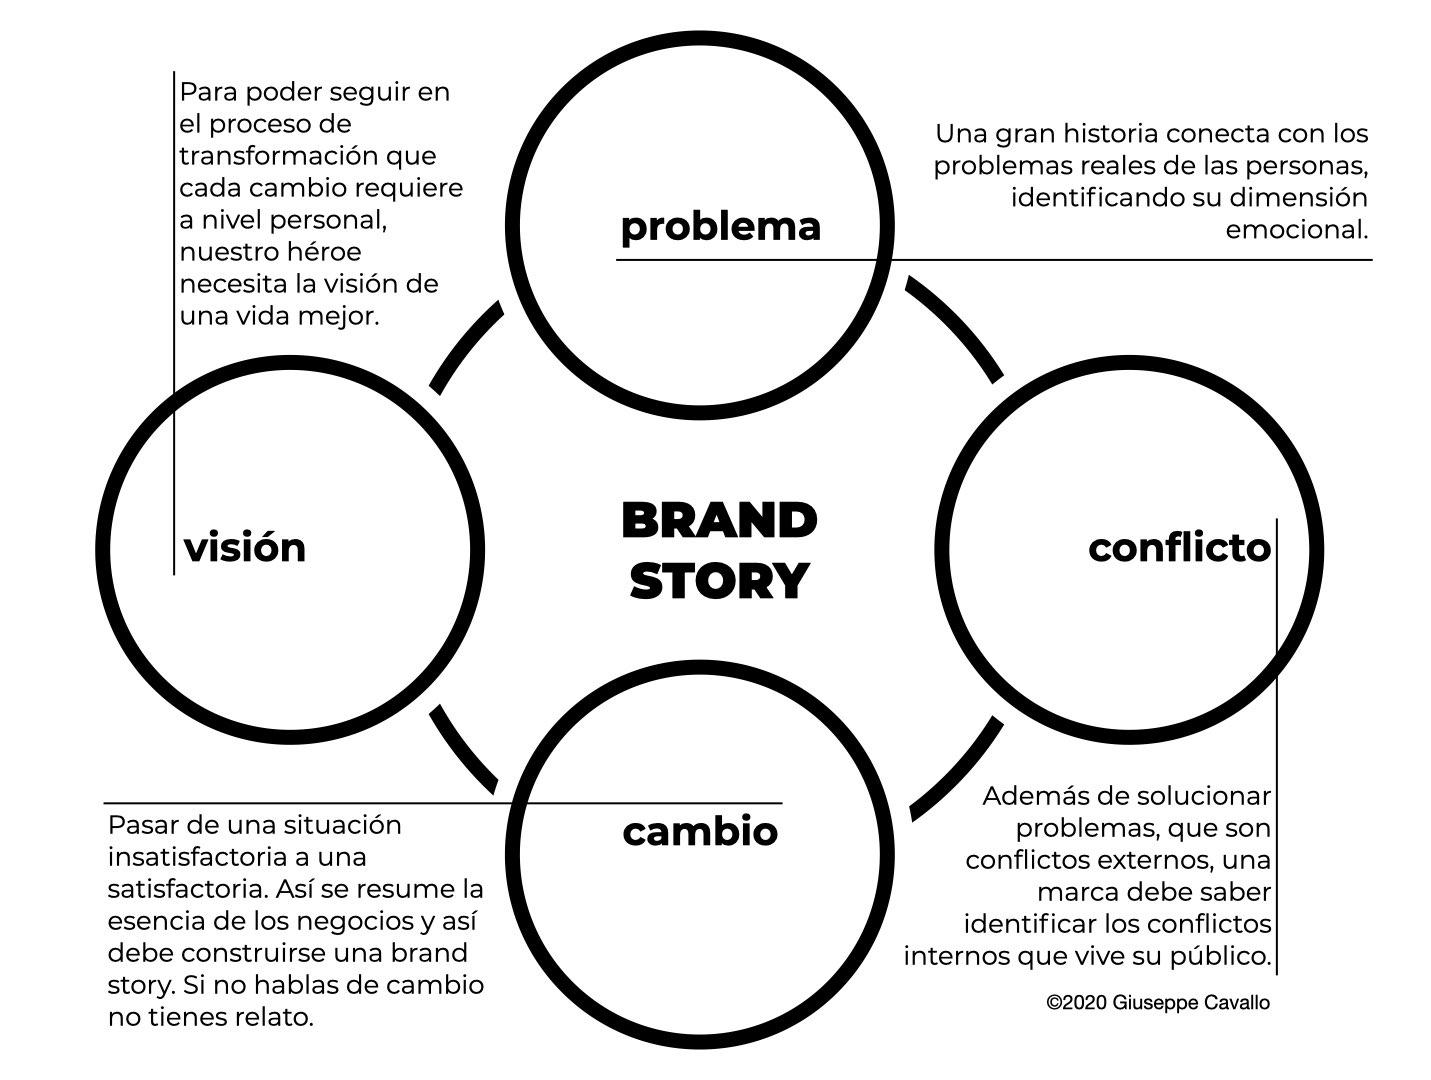 Voxpopuli brand story model